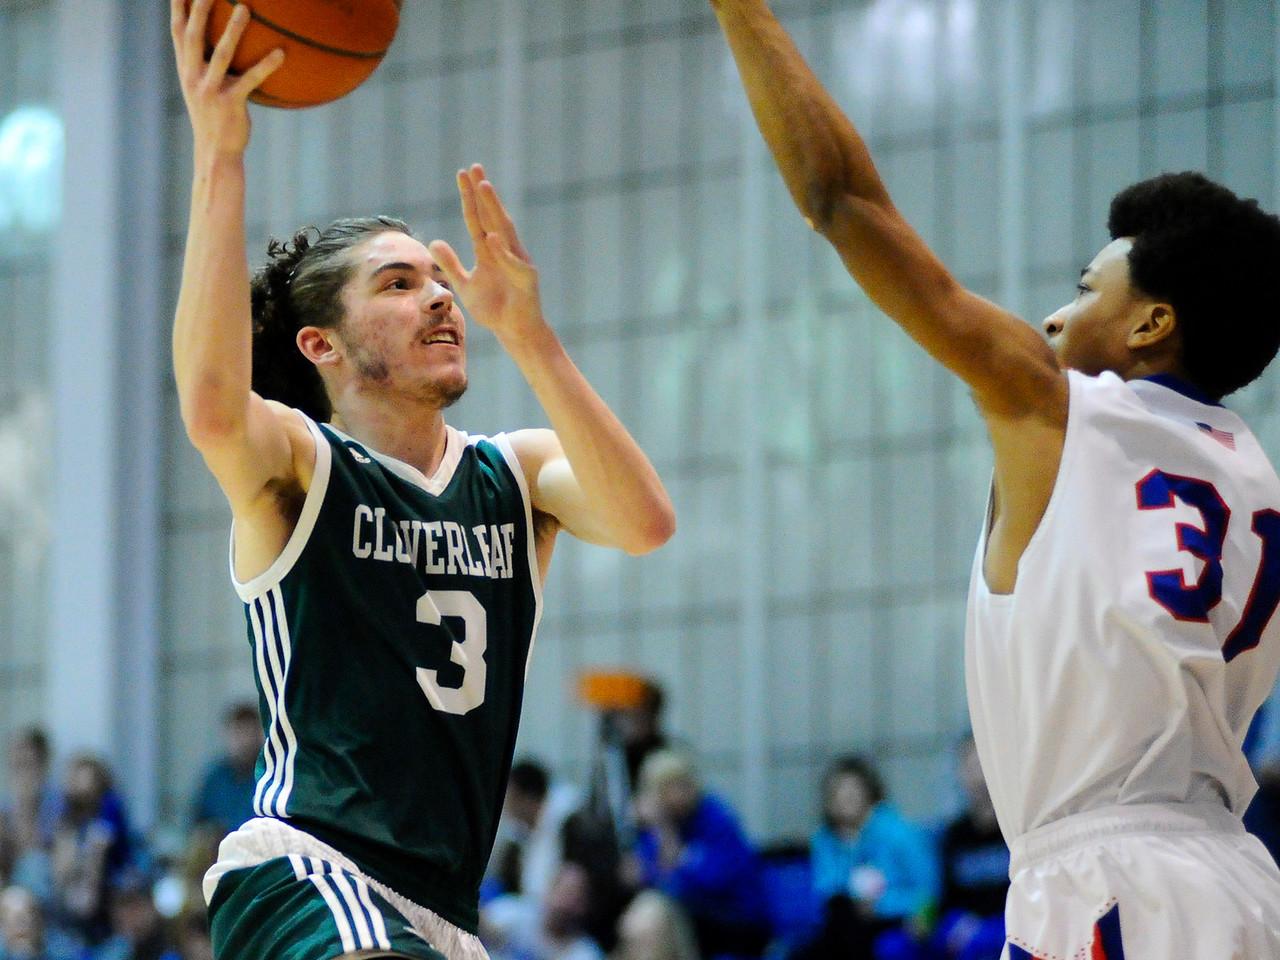 Cloverleaf's Tyler Kapeluck #3 drives to the basket during Friday's game against Ravenna at Ravenna High School. (NICK CAMMETT/GAZETTE)